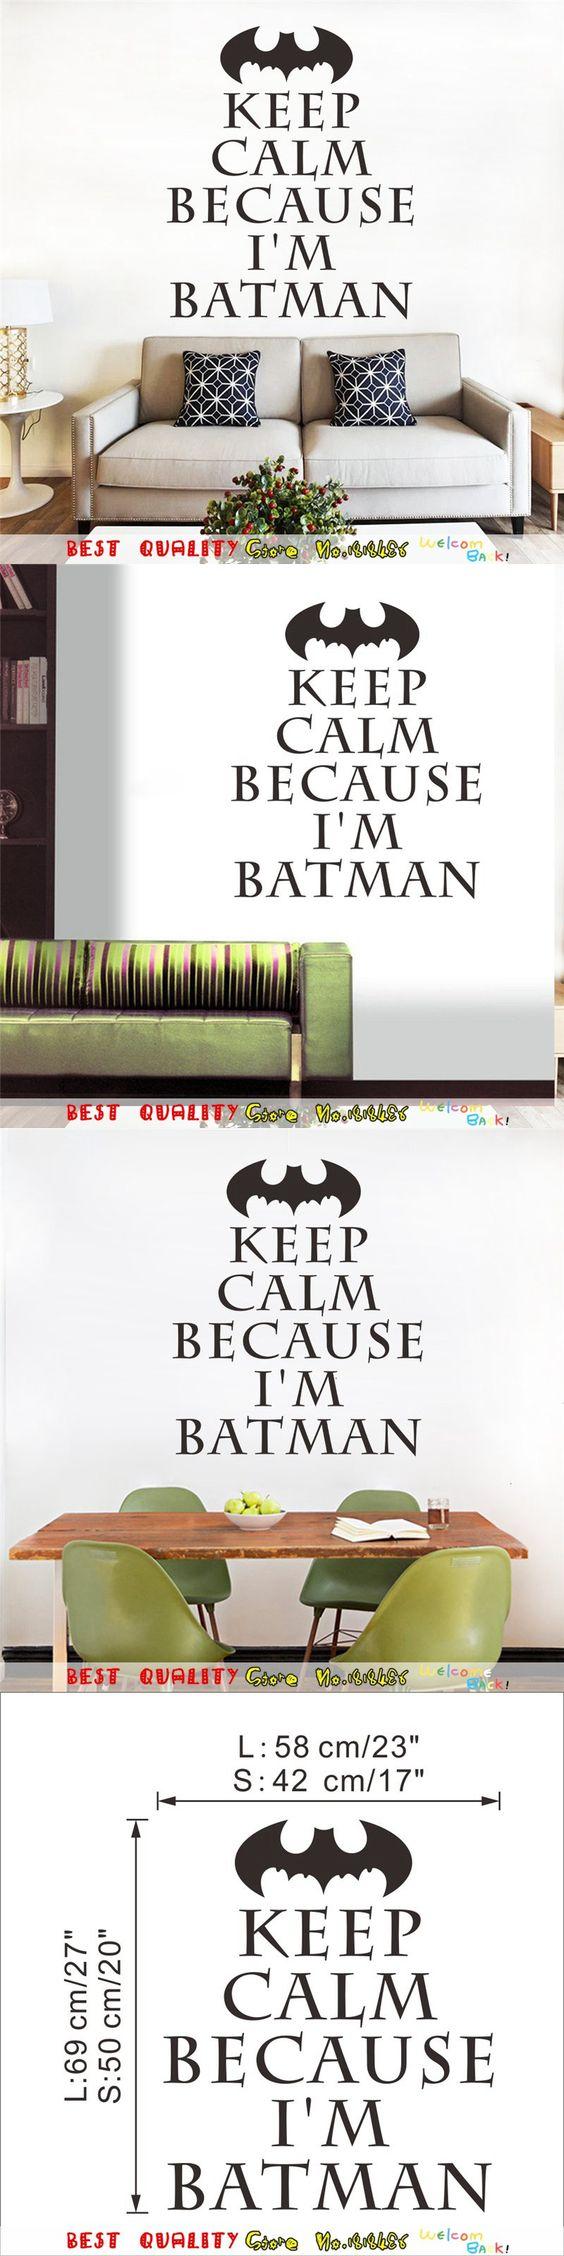 Keep Calm I Am Batman Wall Stickers Kids Bedroom Decoration, Vinyl Home Decal Movie Poster Mual Art Sticker Adesivo De Paredes